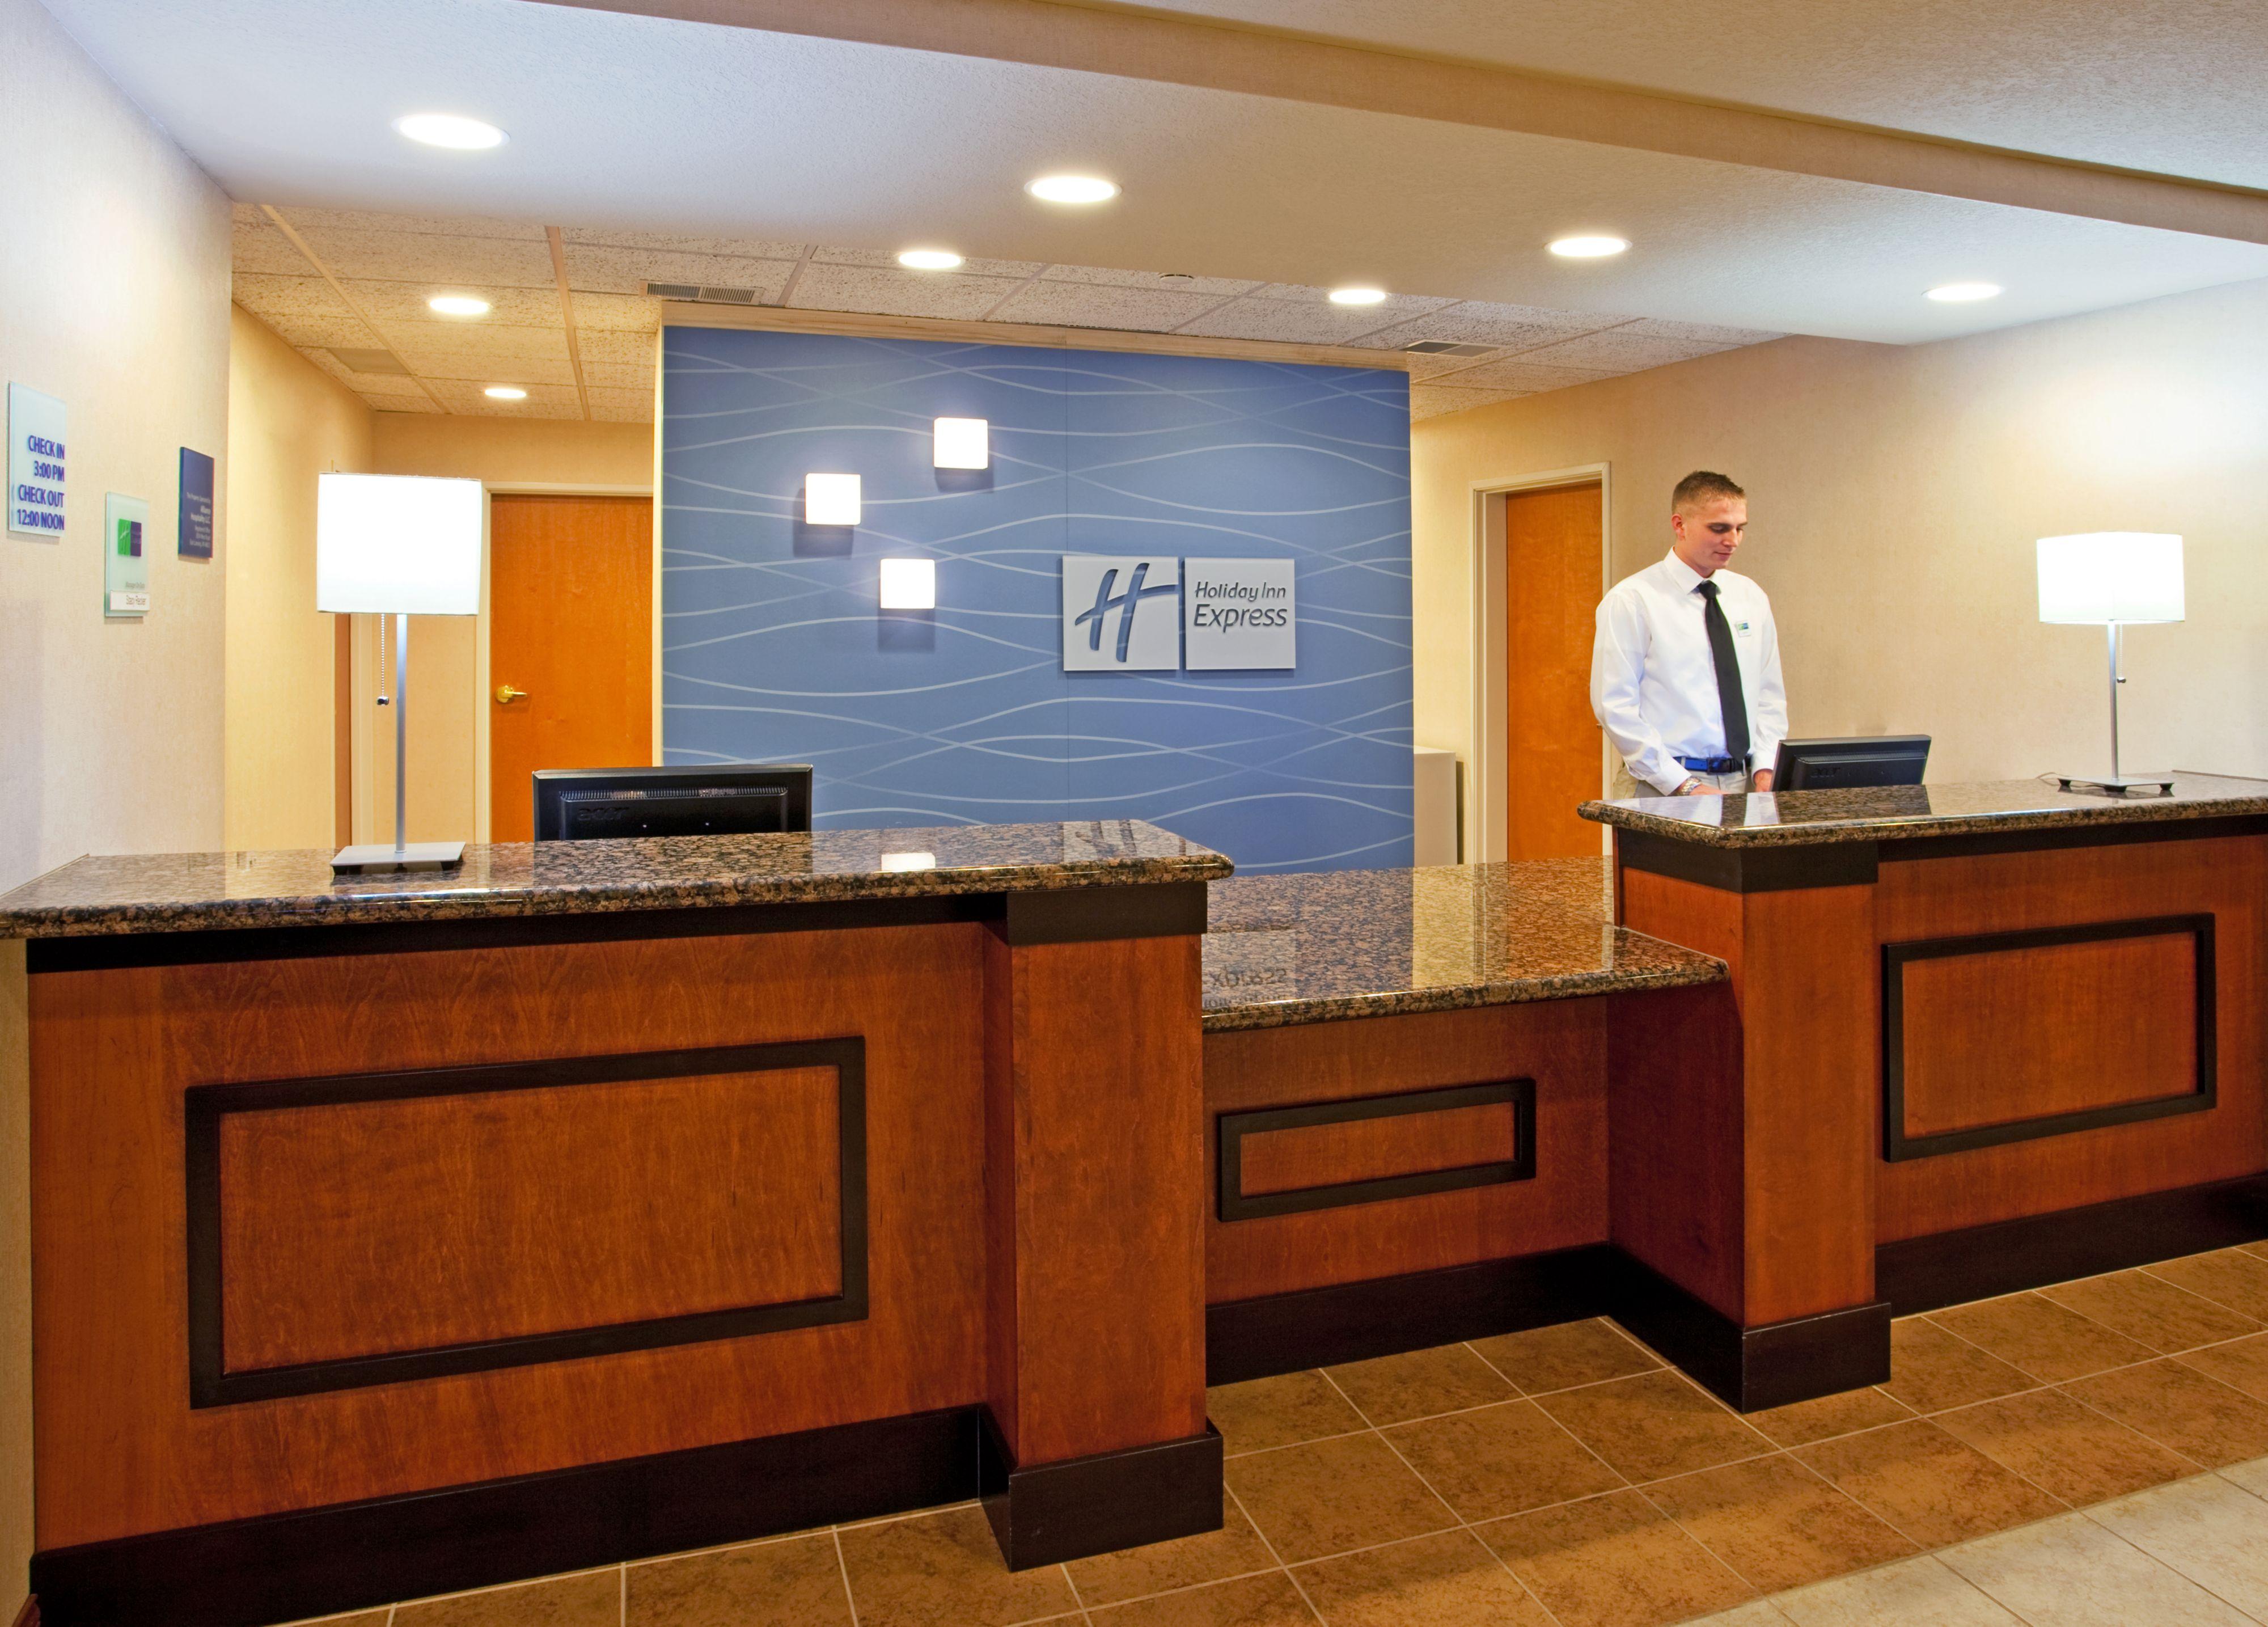 Holiday Inn Express & Suites East Lansing image 8